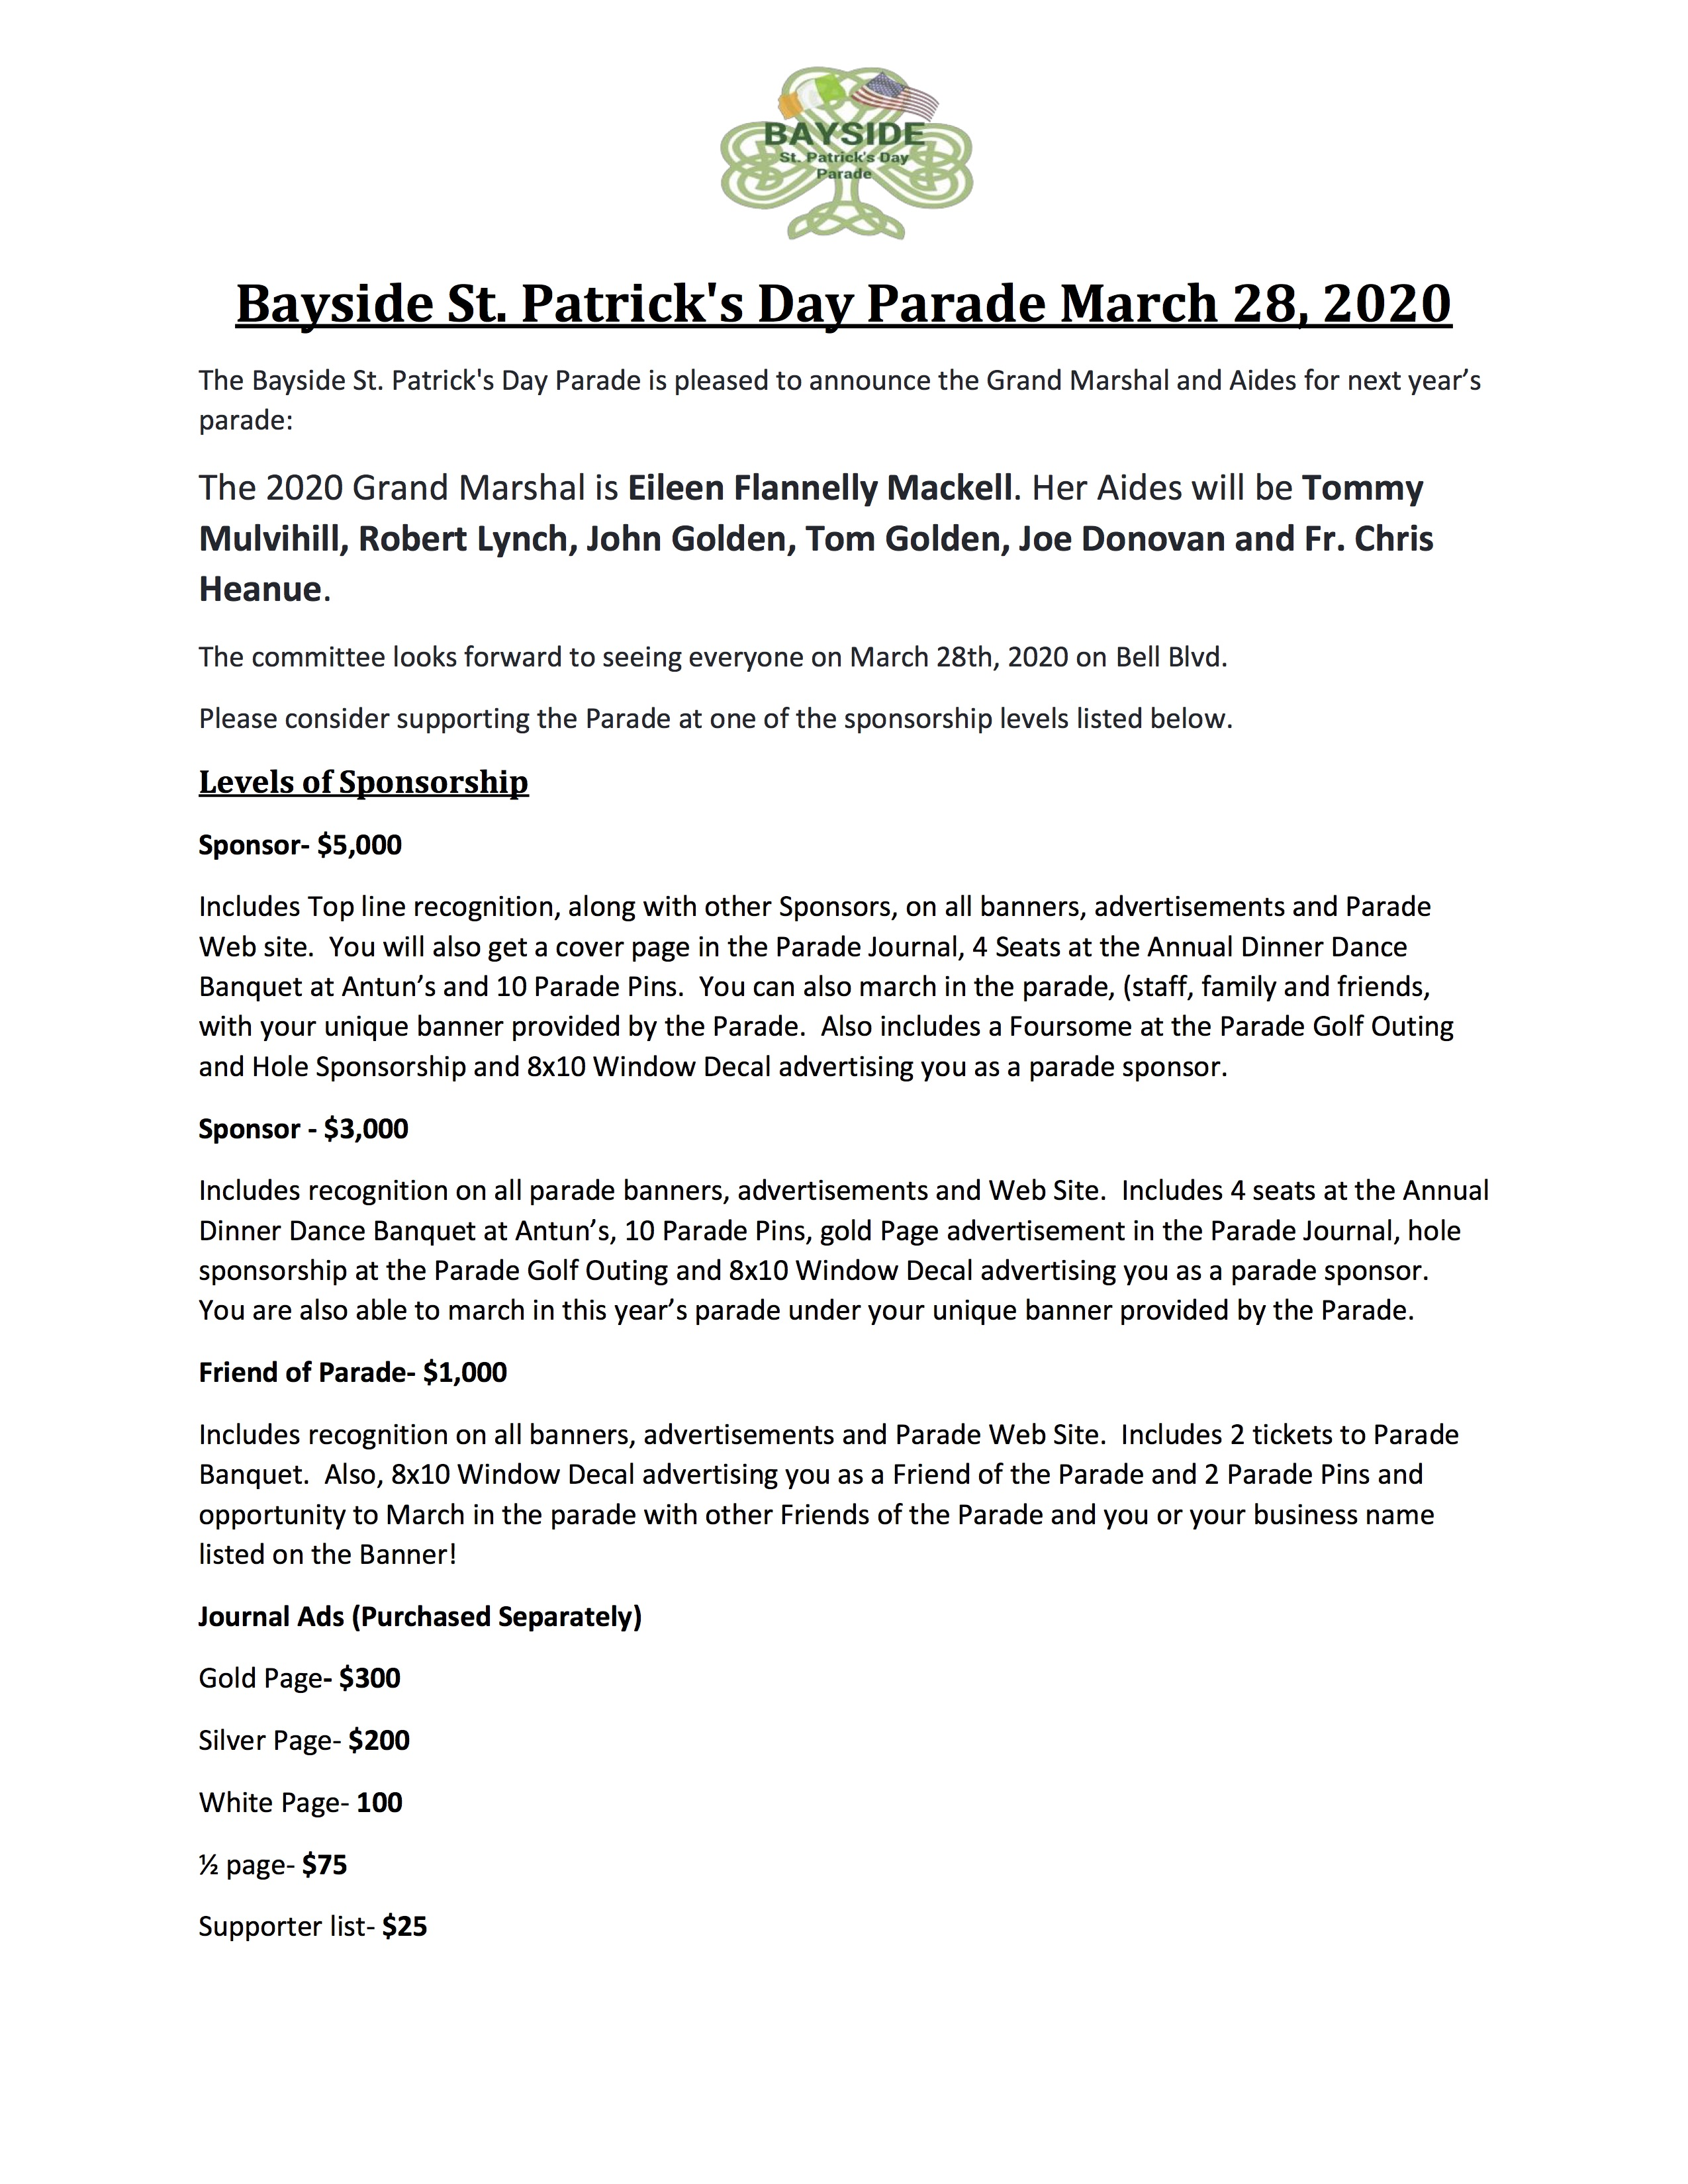 2020 Bayside Parade levels of sponsorship